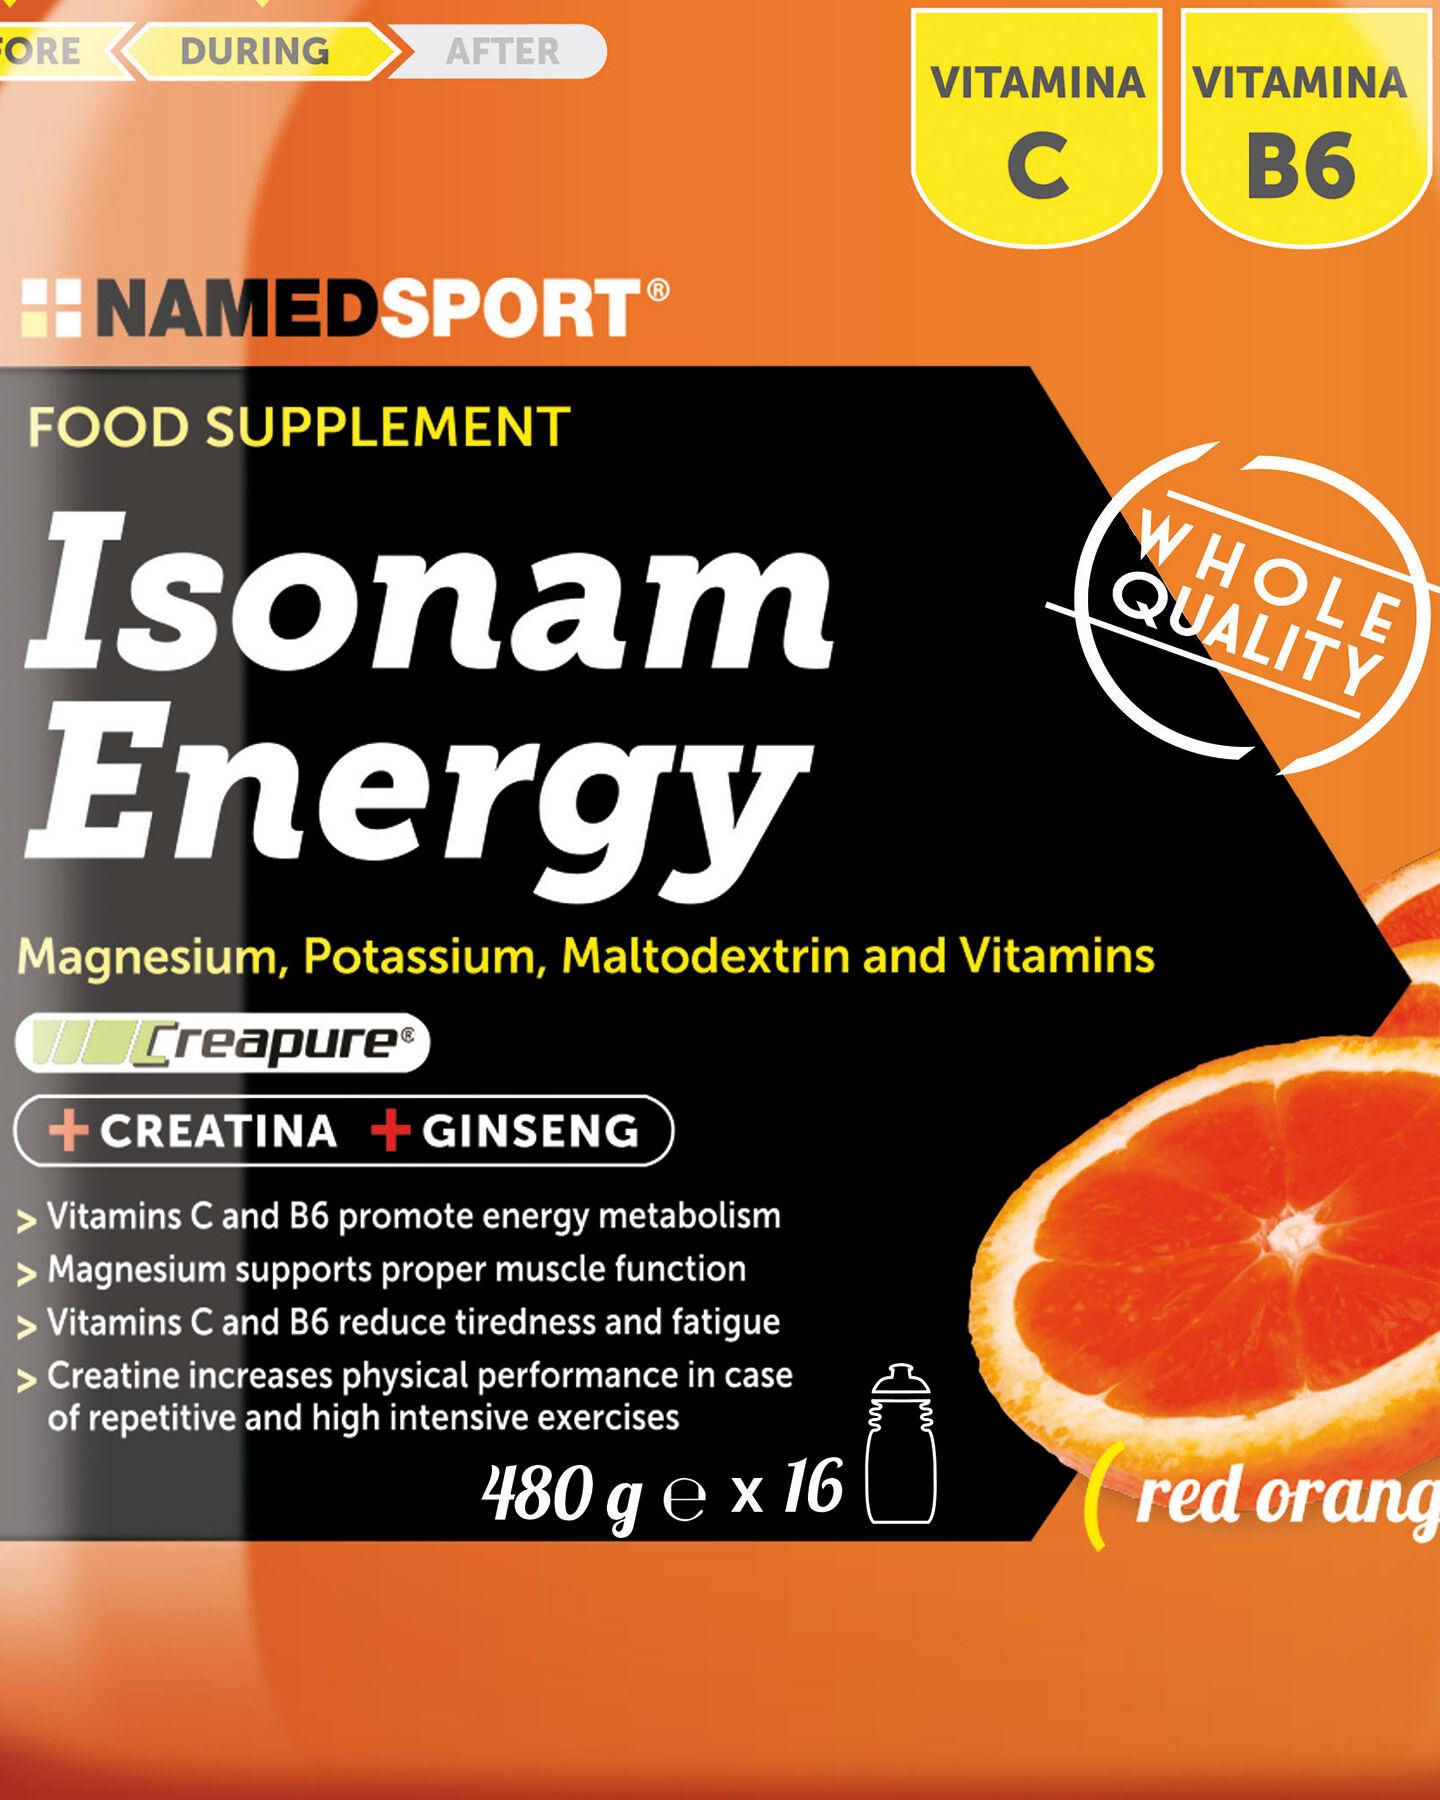 Energetico NAMED SPORT ISONAM ENERGY ORANGE 480 GR S1308862 1 UNI scatto 1